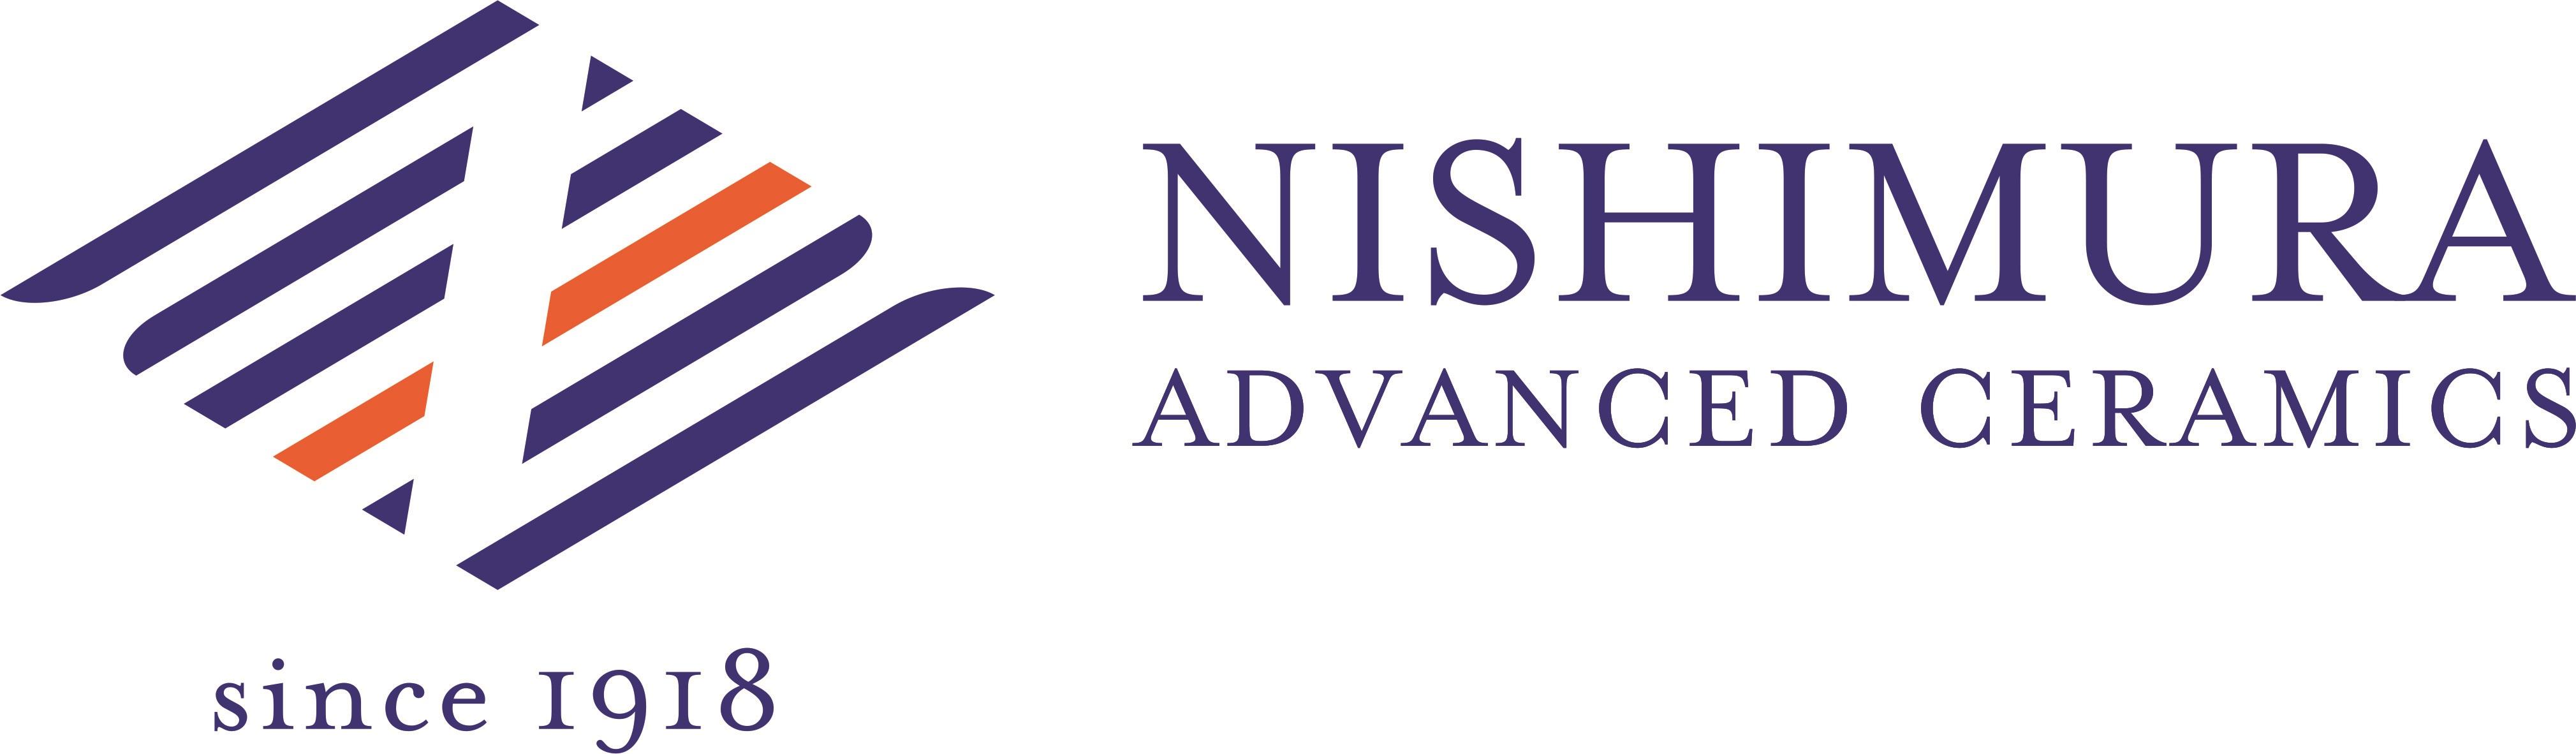 Nishimura Advanced Ceramics